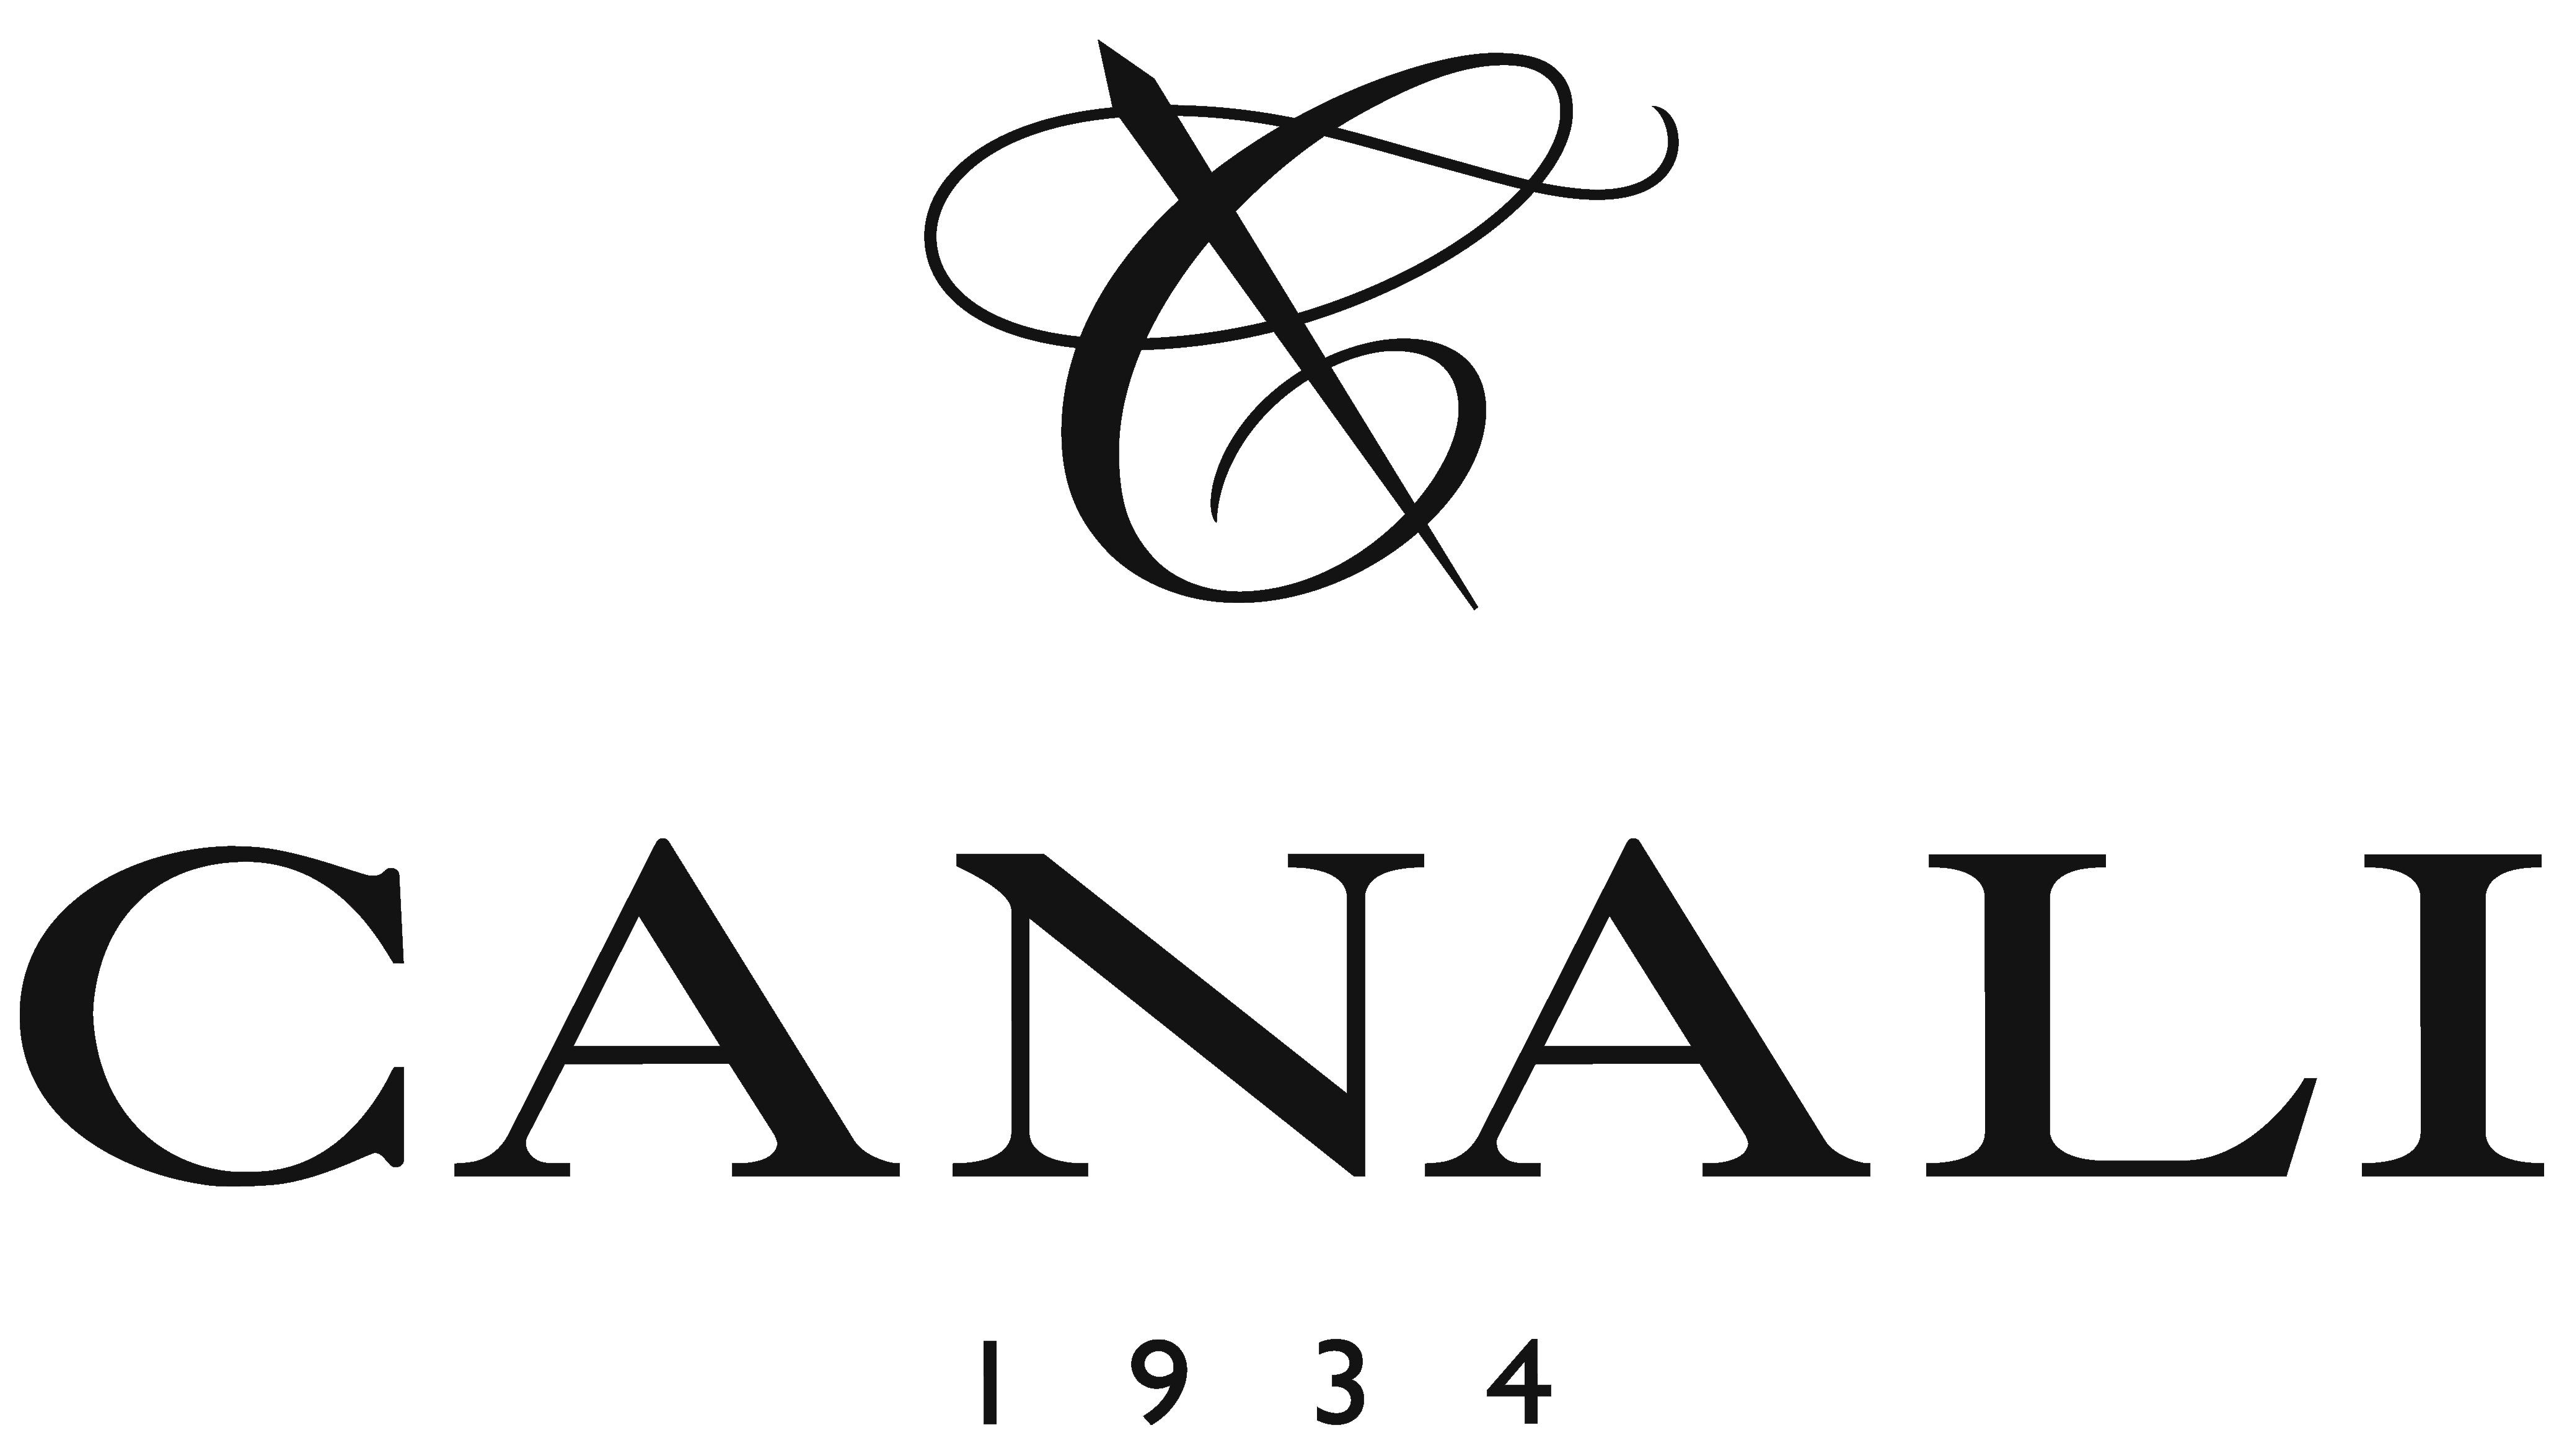 canali logos download top fashion brand logos famous fashion brand logos